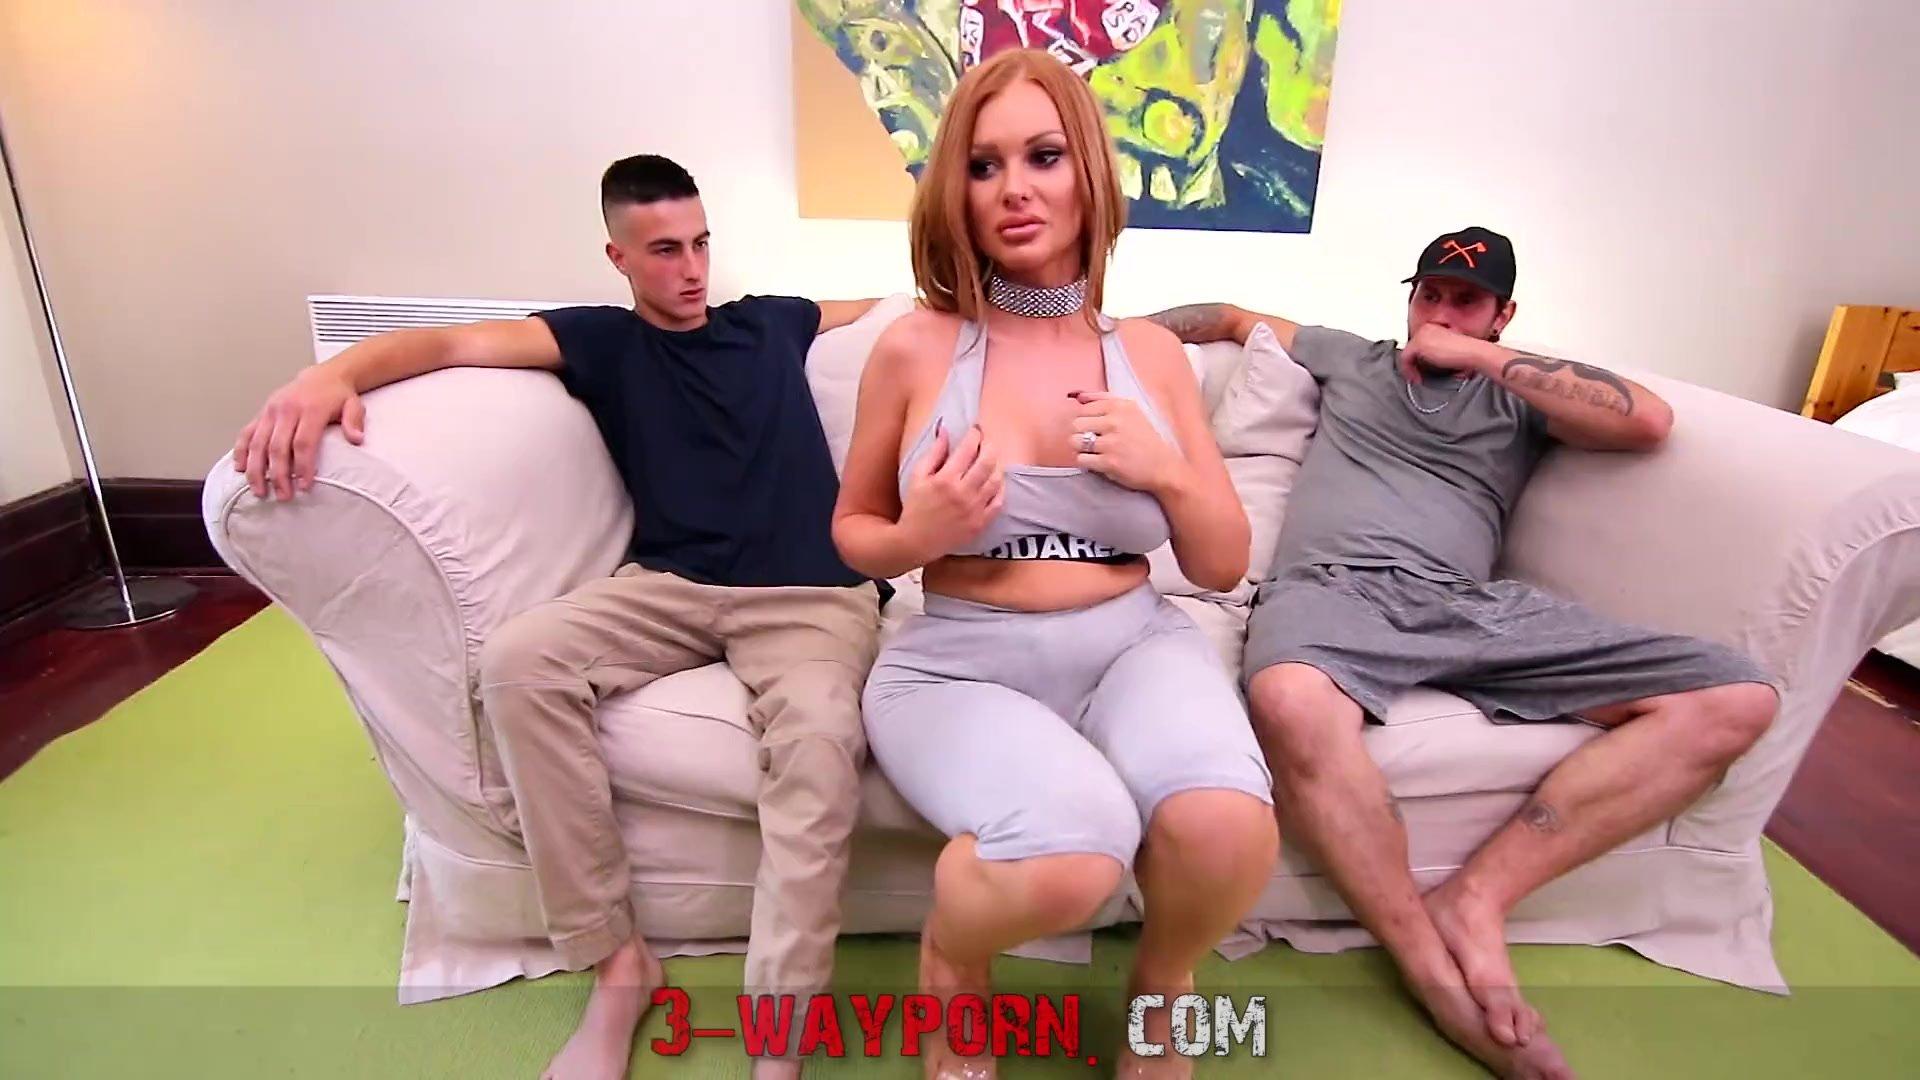 3-Way Porn - Amateur Trios Dirty Fuck